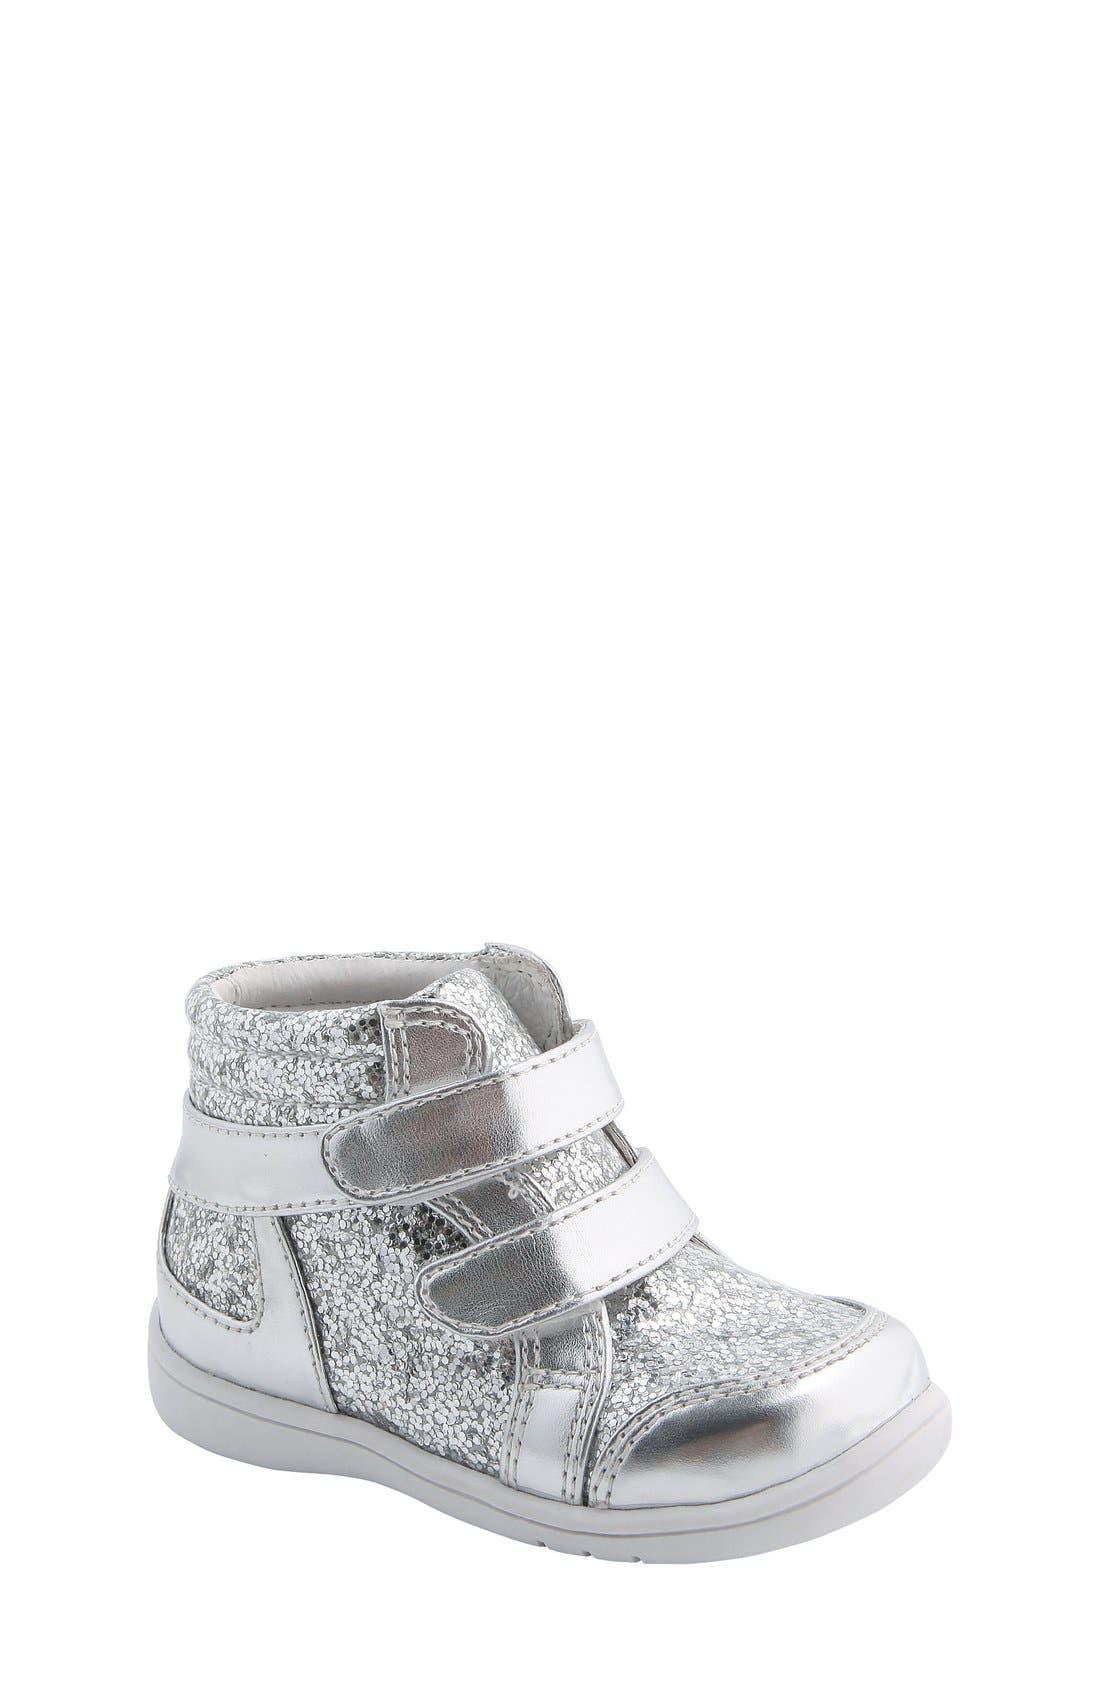 Nina 'Stardust' Metallic High Top Sneaker,                             Main thumbnail 1, color,                             Silver Metallic